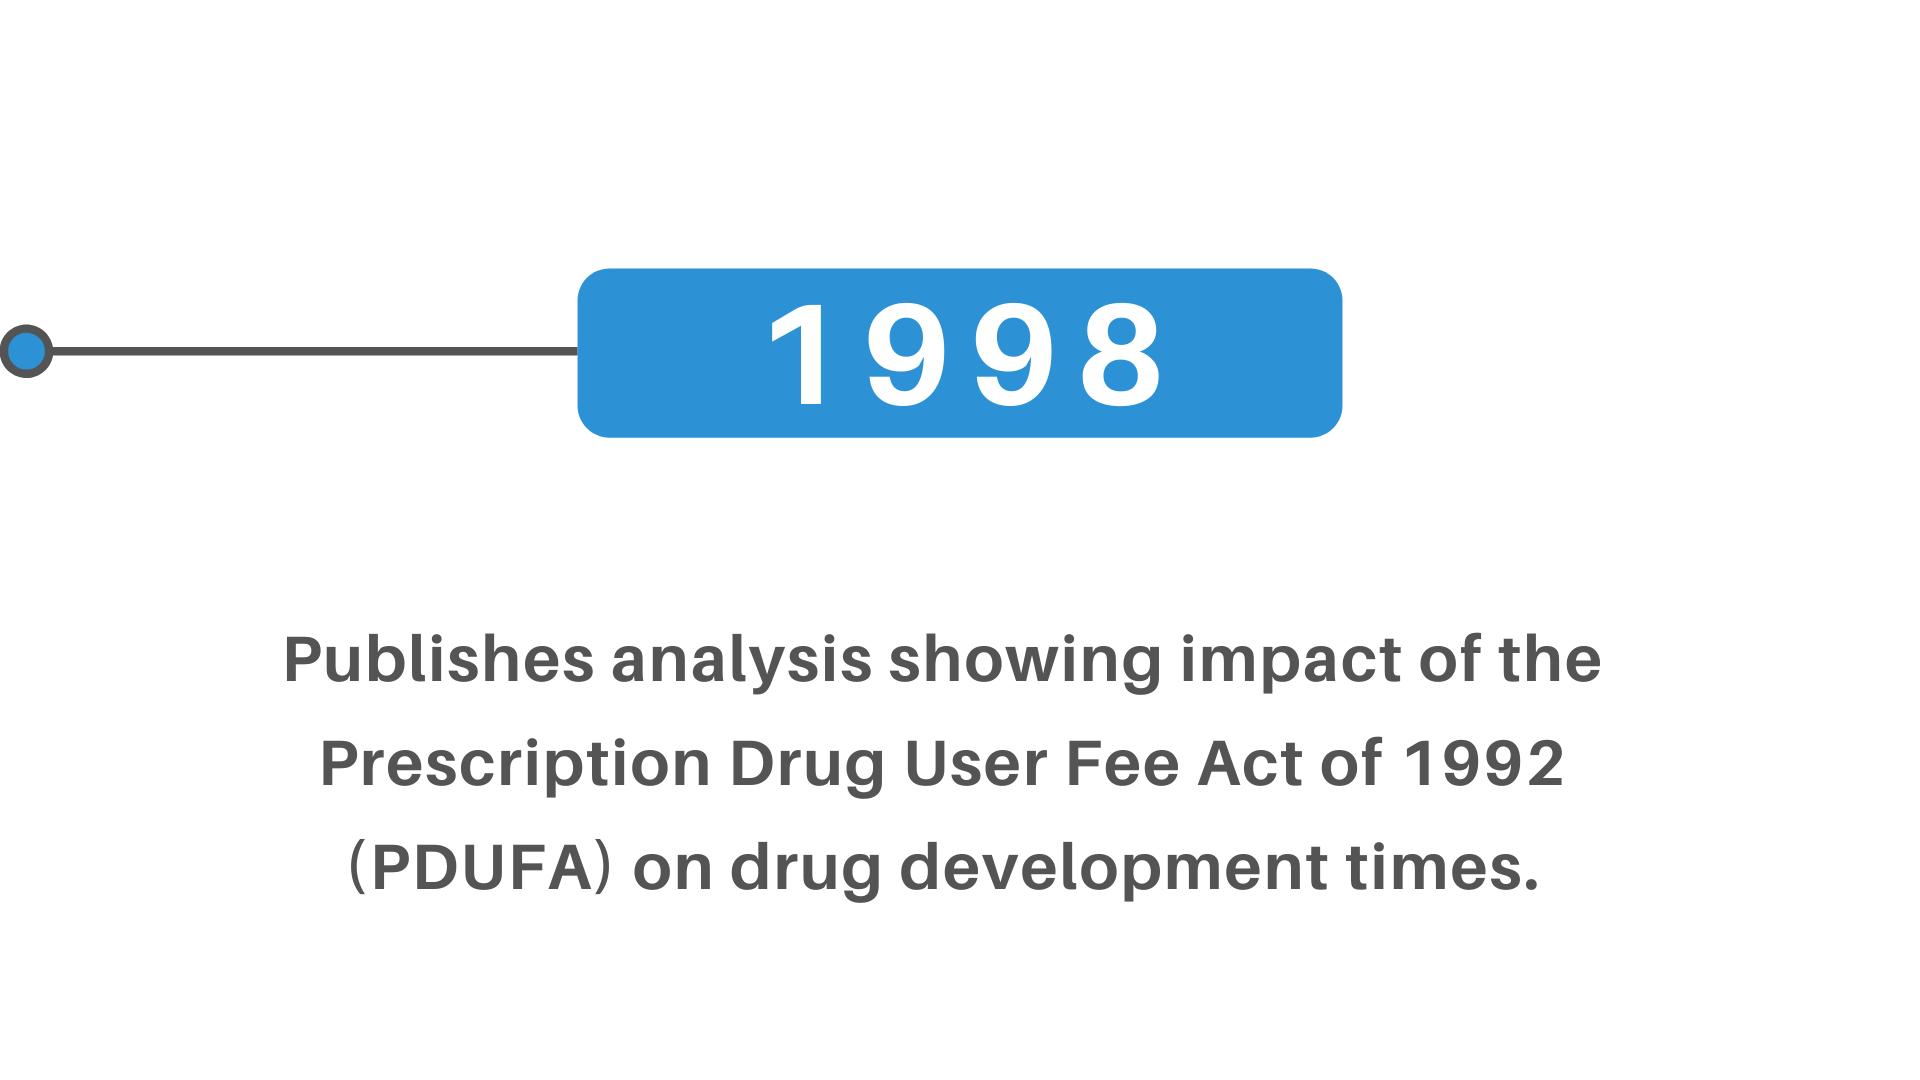 PDUFA drug development times